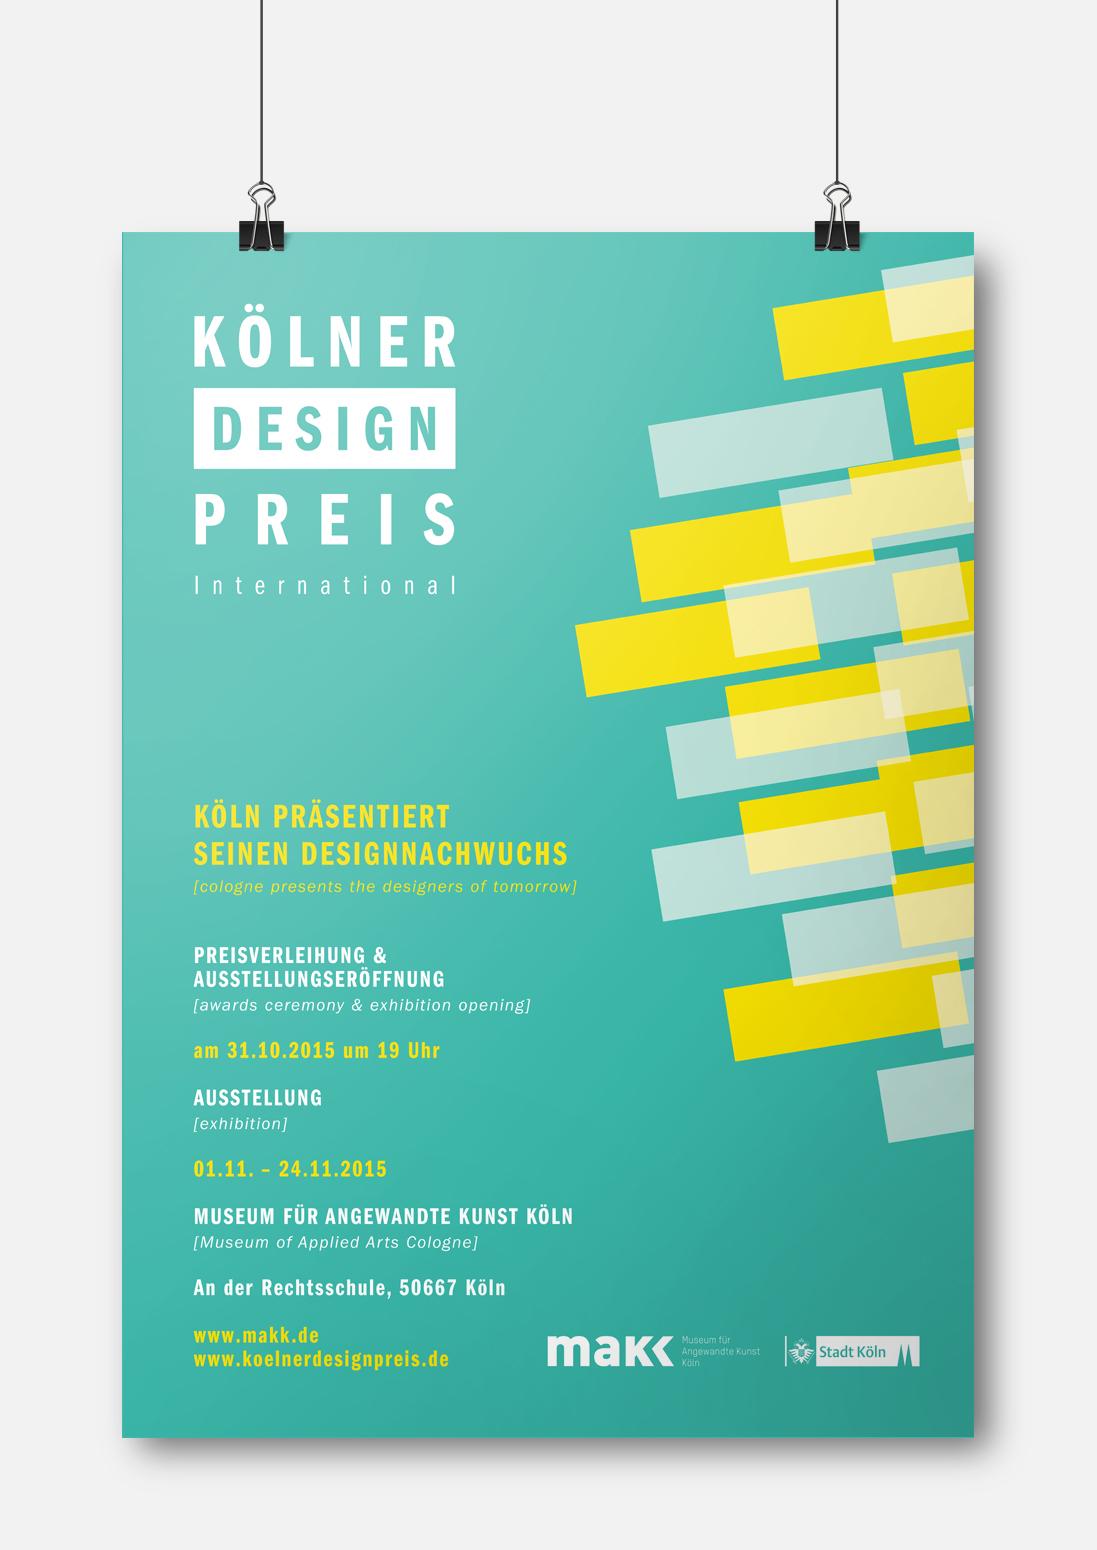 Kölner Design Preis – Poster